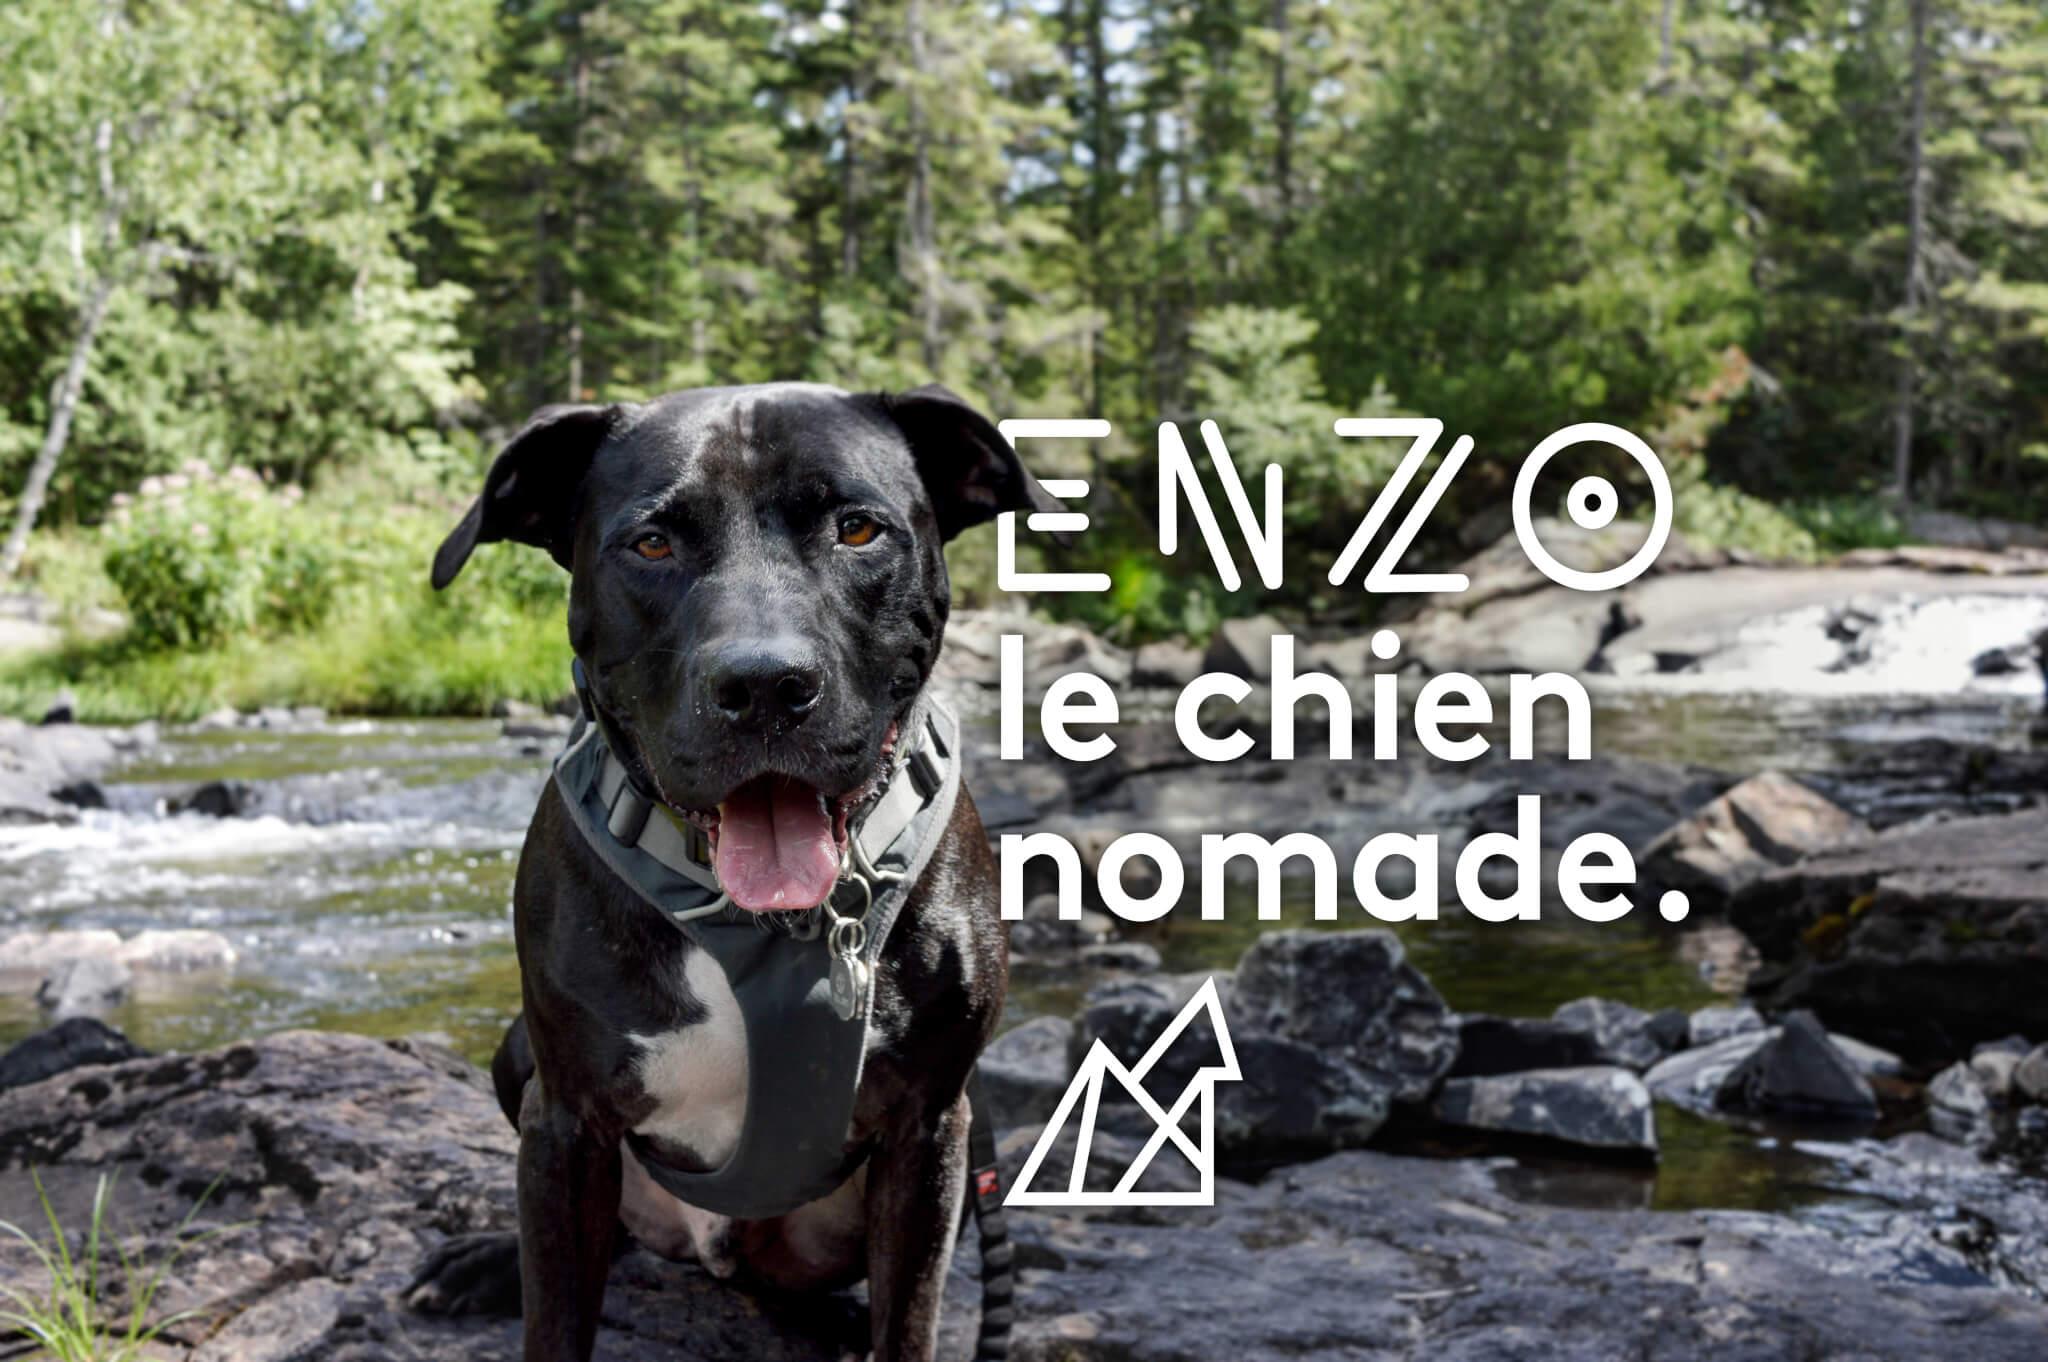 Enzo, le chien nomade !